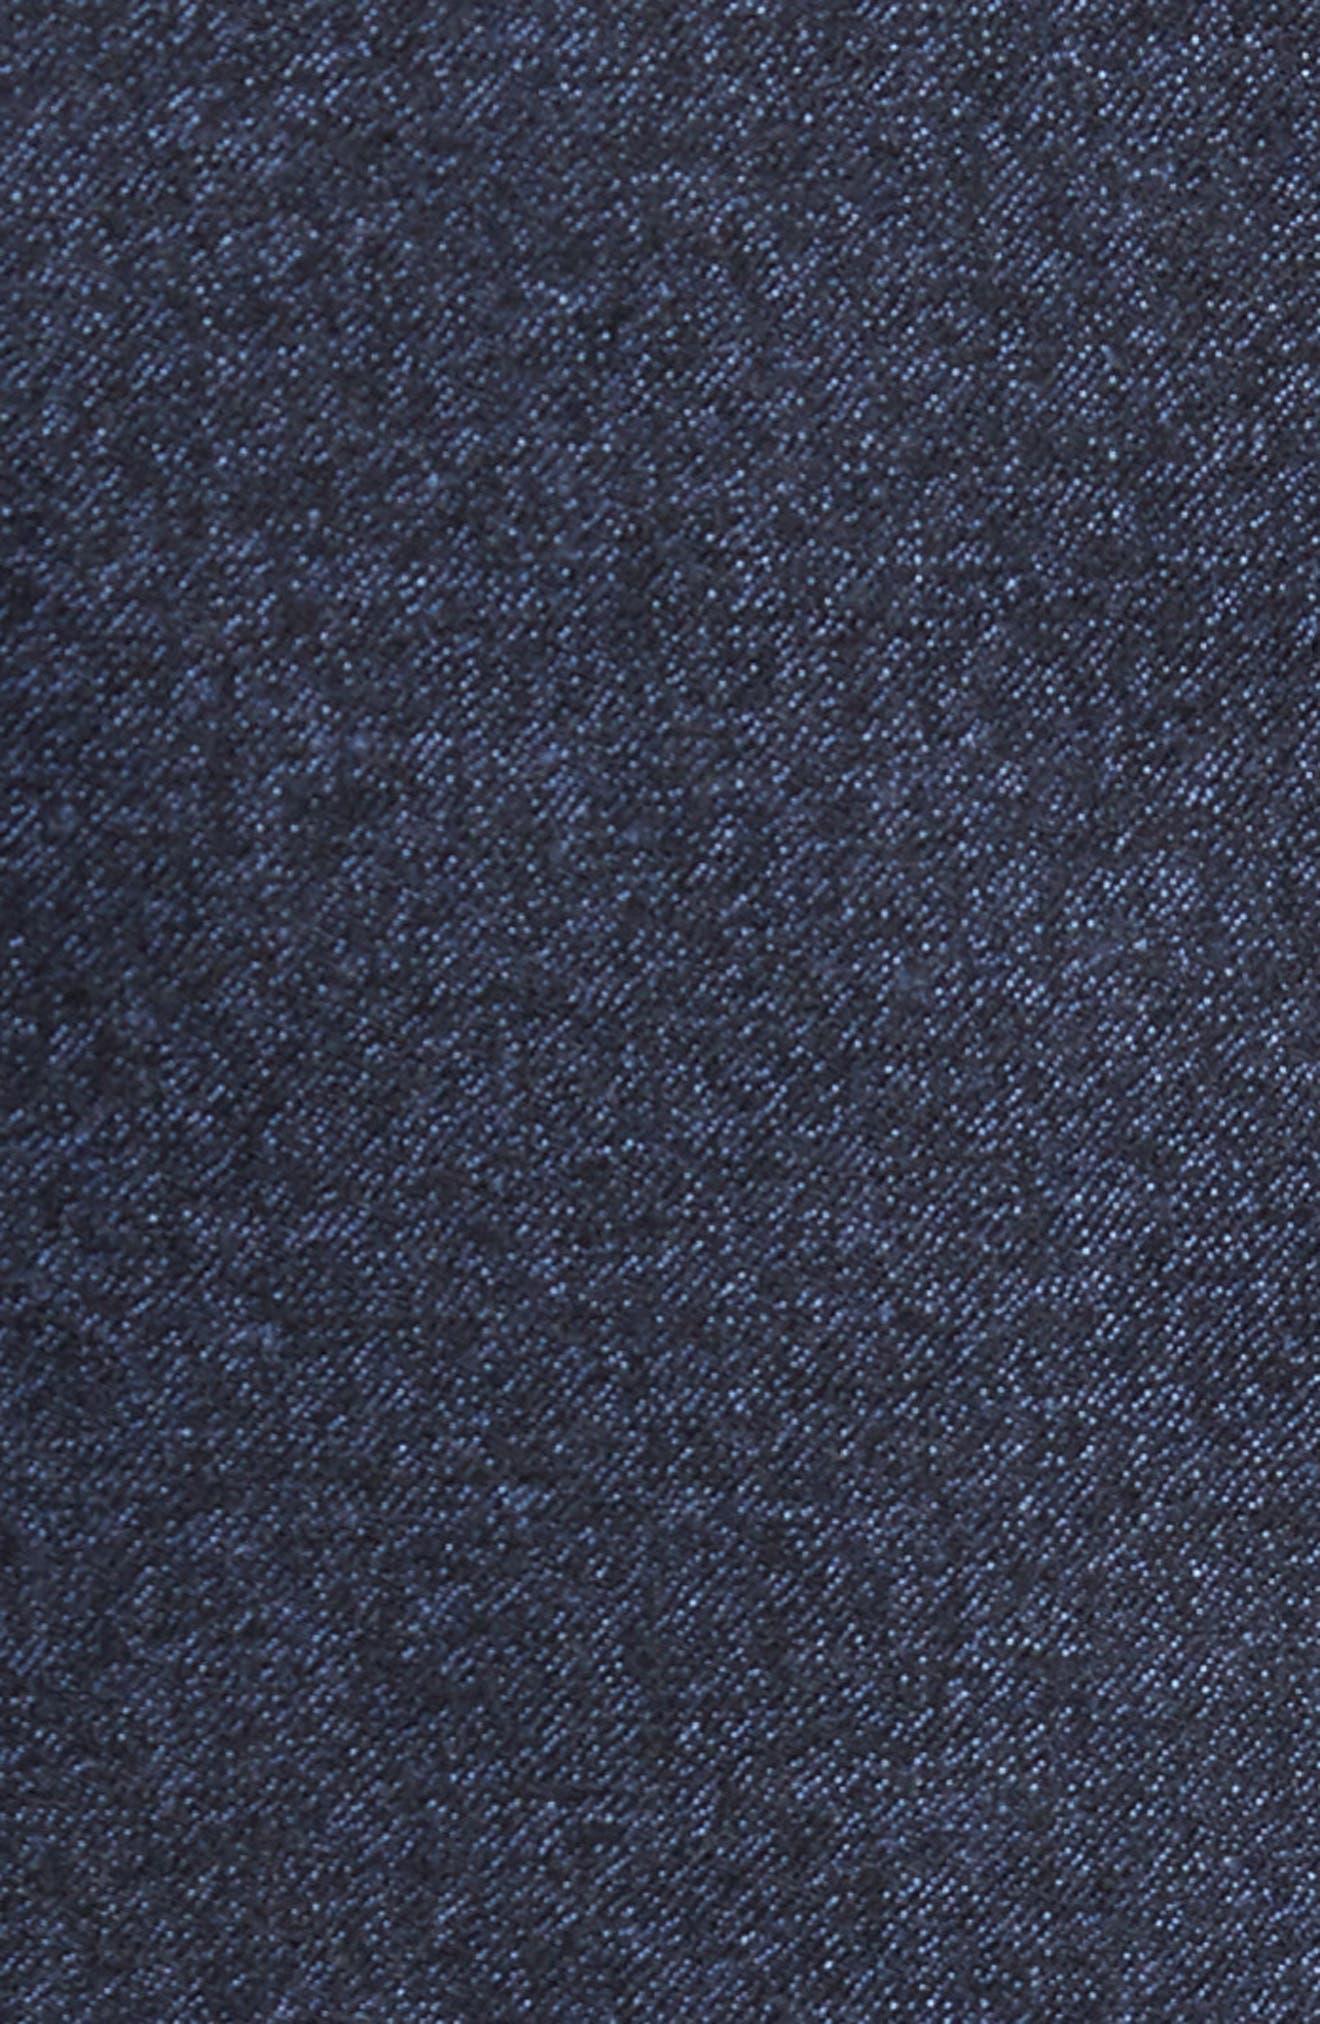 Tucker Trim Fit Wool Blazer,                             Alternate thumbnail 6, color,                             BLUE